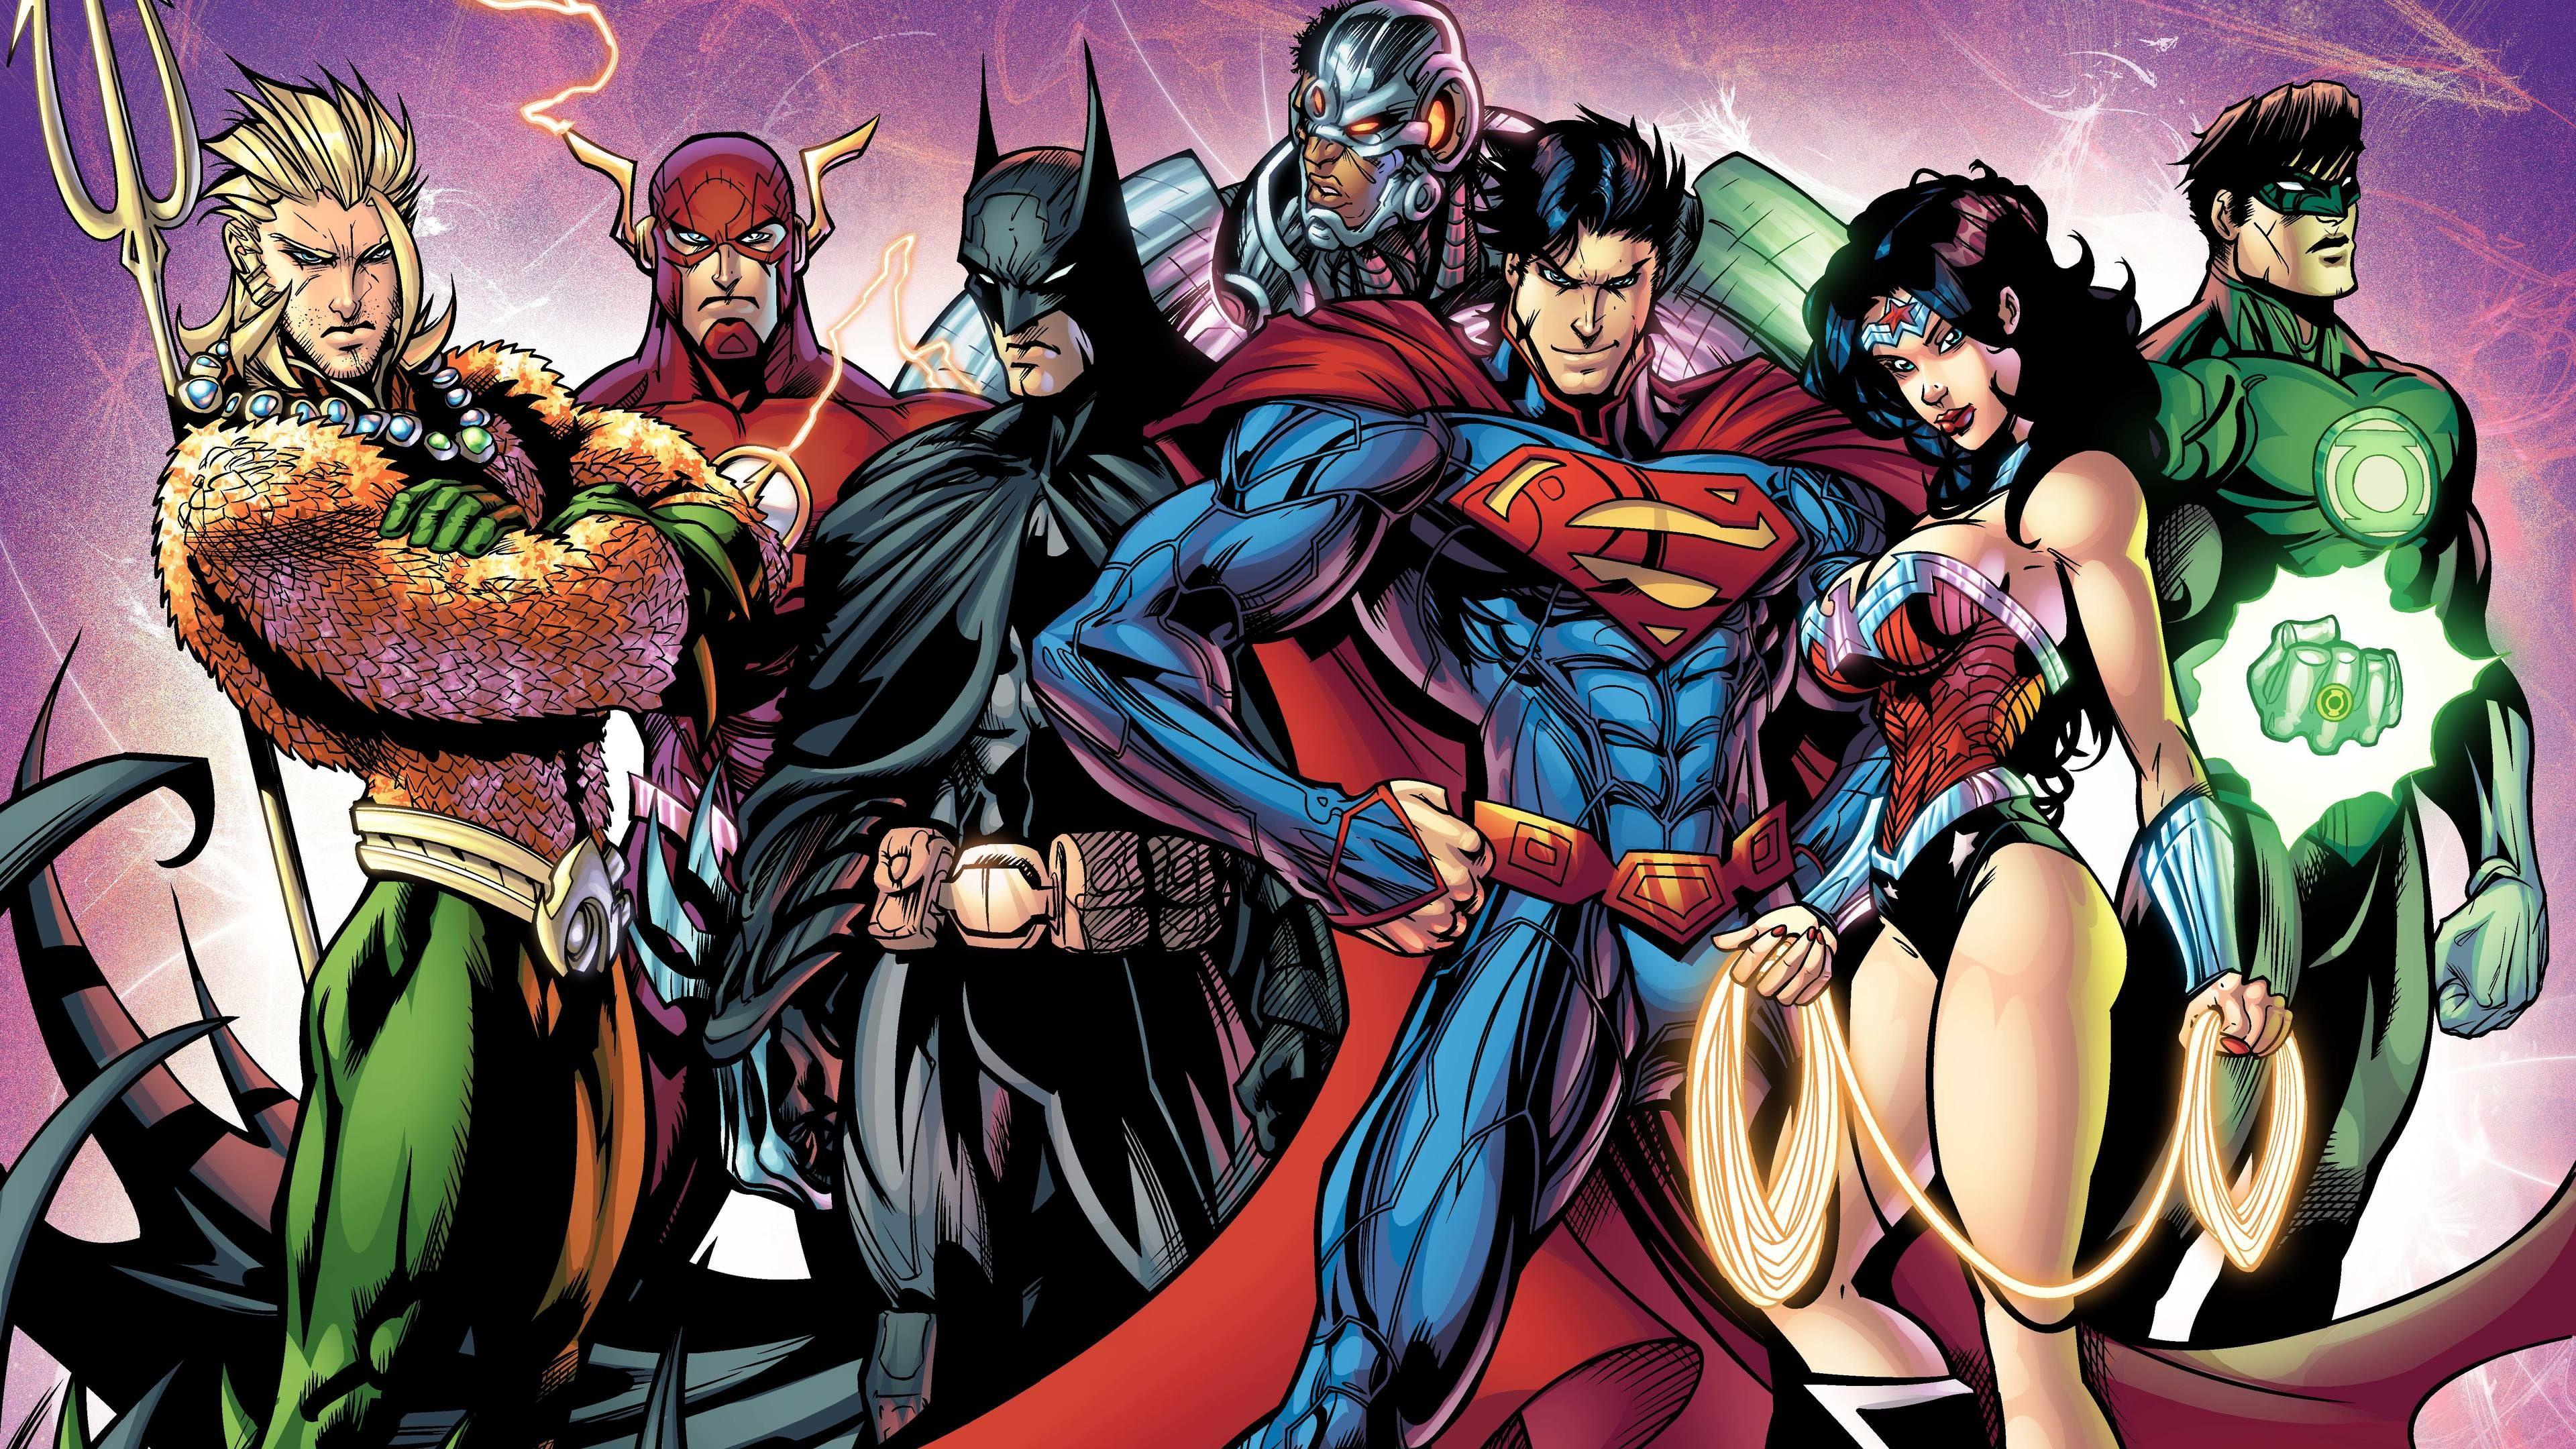 Justice League Superheroes Artwork 8k Aquaman Artwork Justice League Artwork Batman Wallpaper